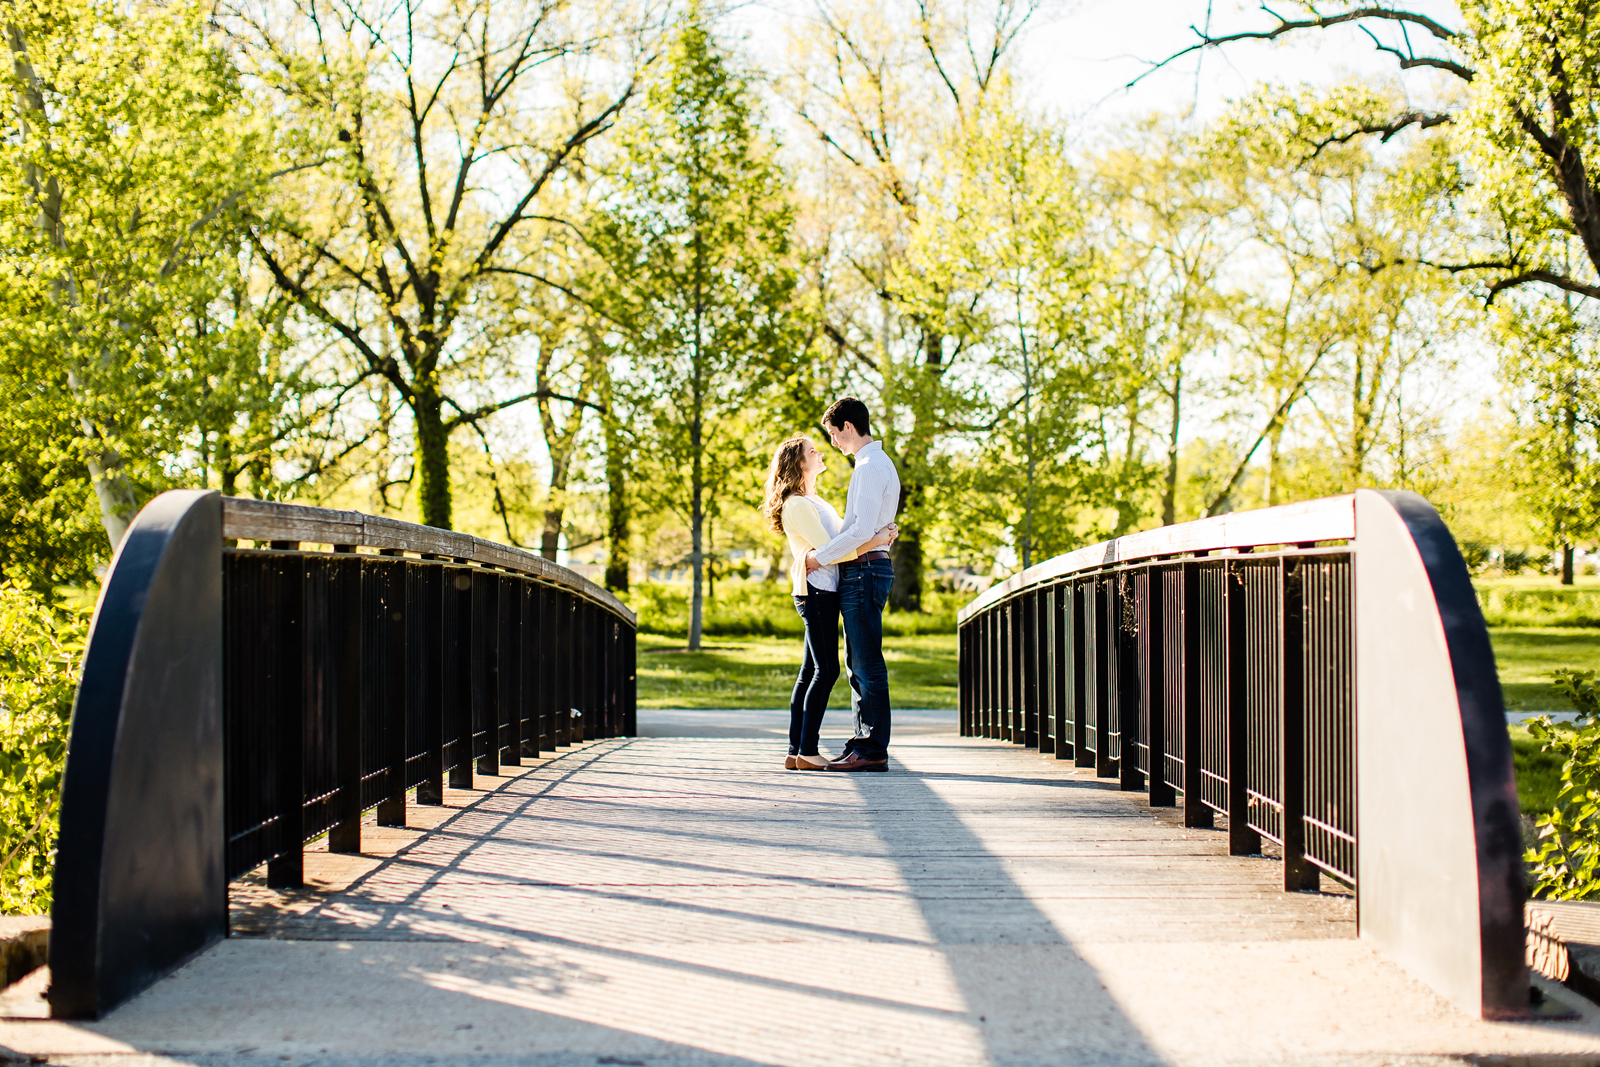 Forest Park Engagement Session St Louis Wedding Photographer Oldani Photography 3.jpg